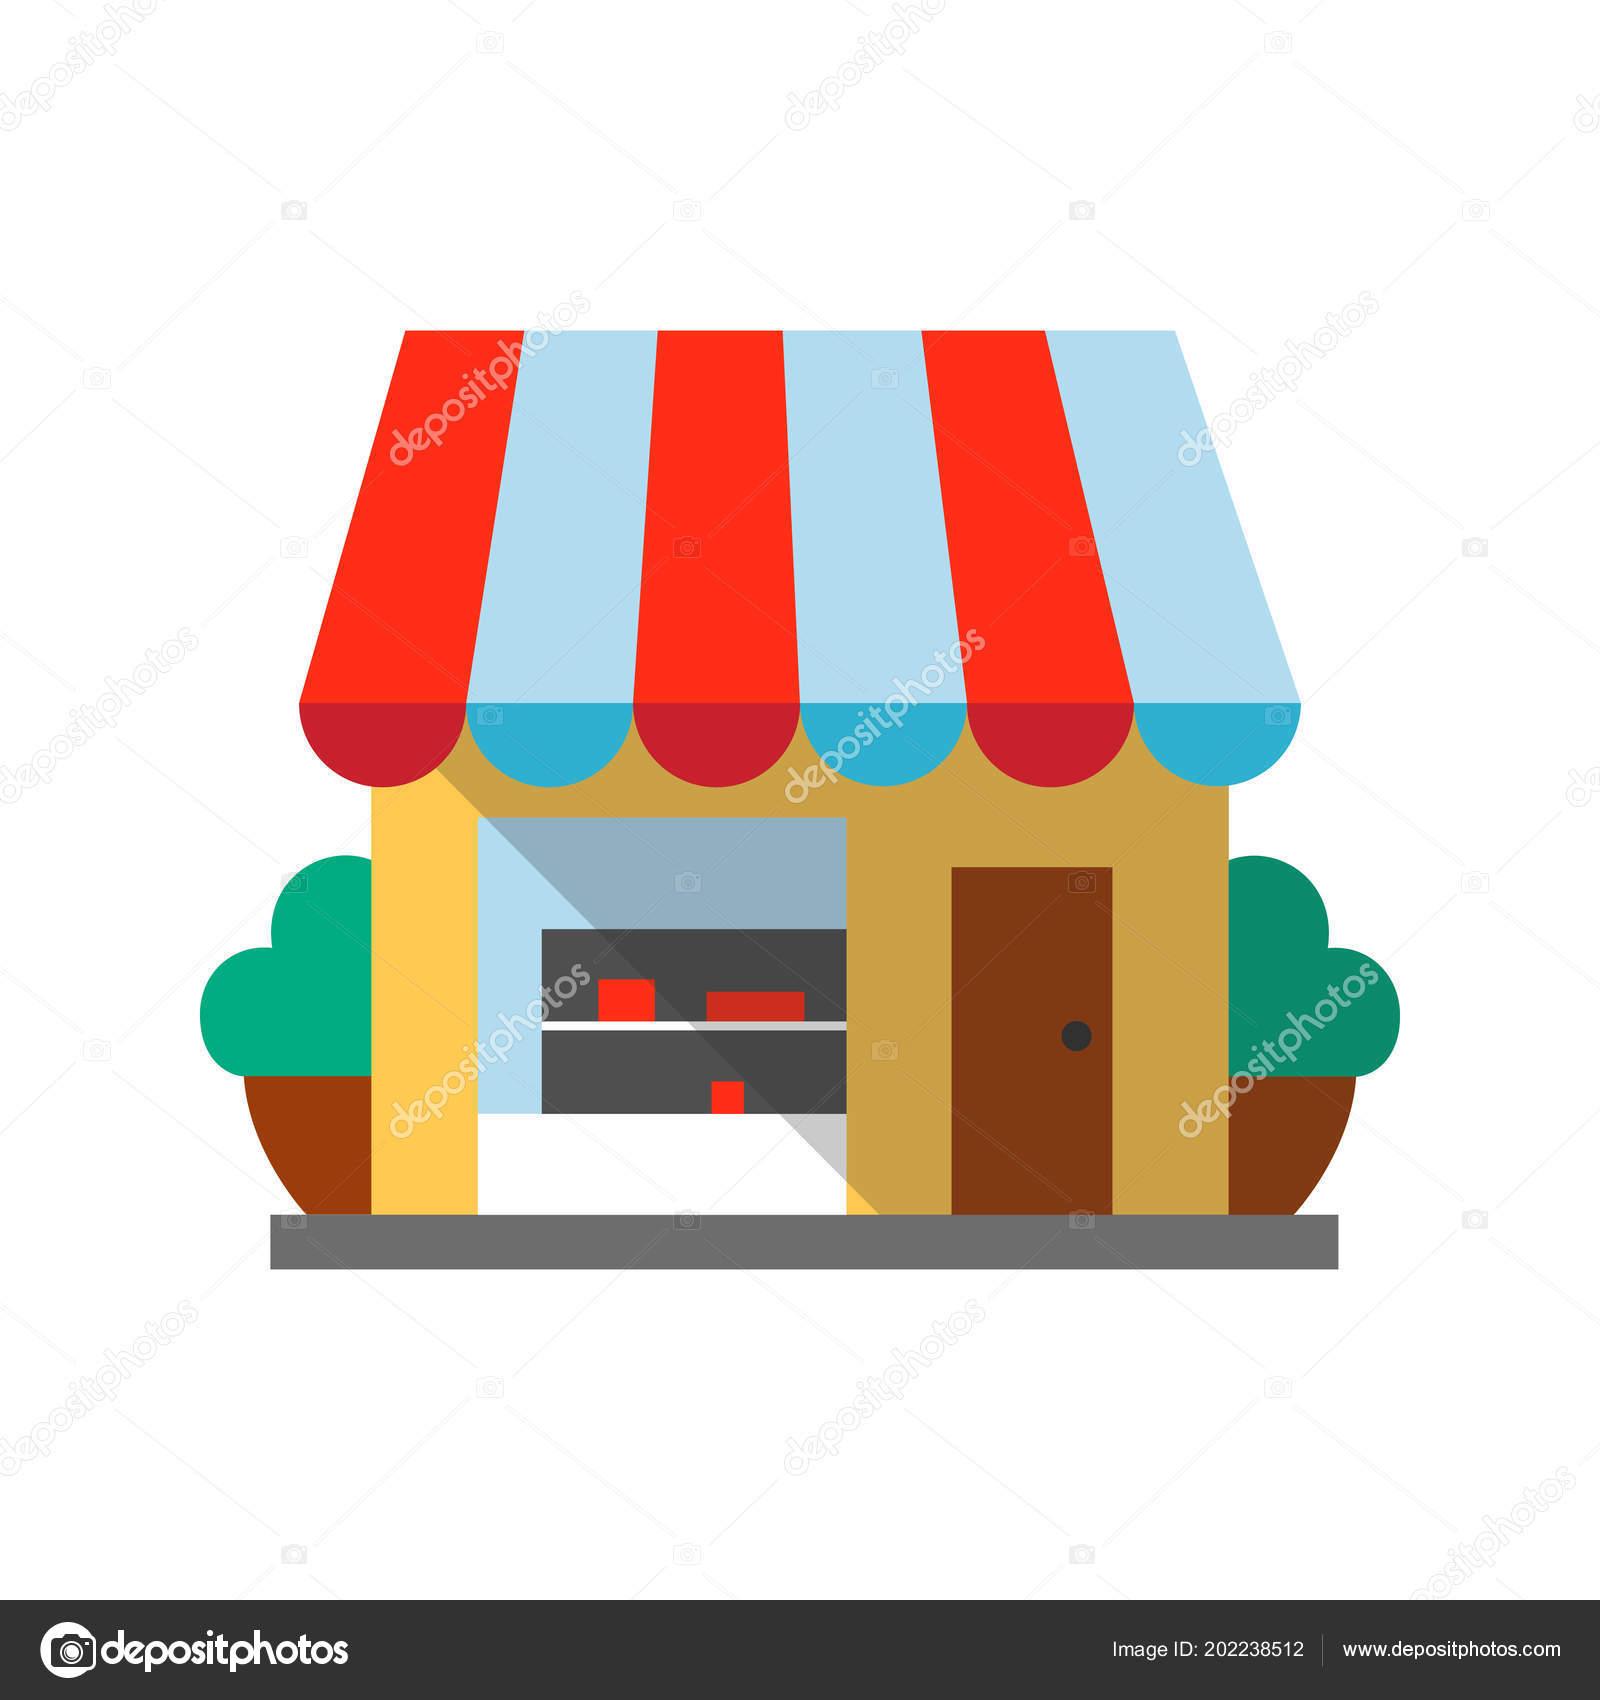 Photos Small Shop Design Small Shop Flat Design Long Shadow Color Icon Grocery Store Stock Vector C Bsd 202238512